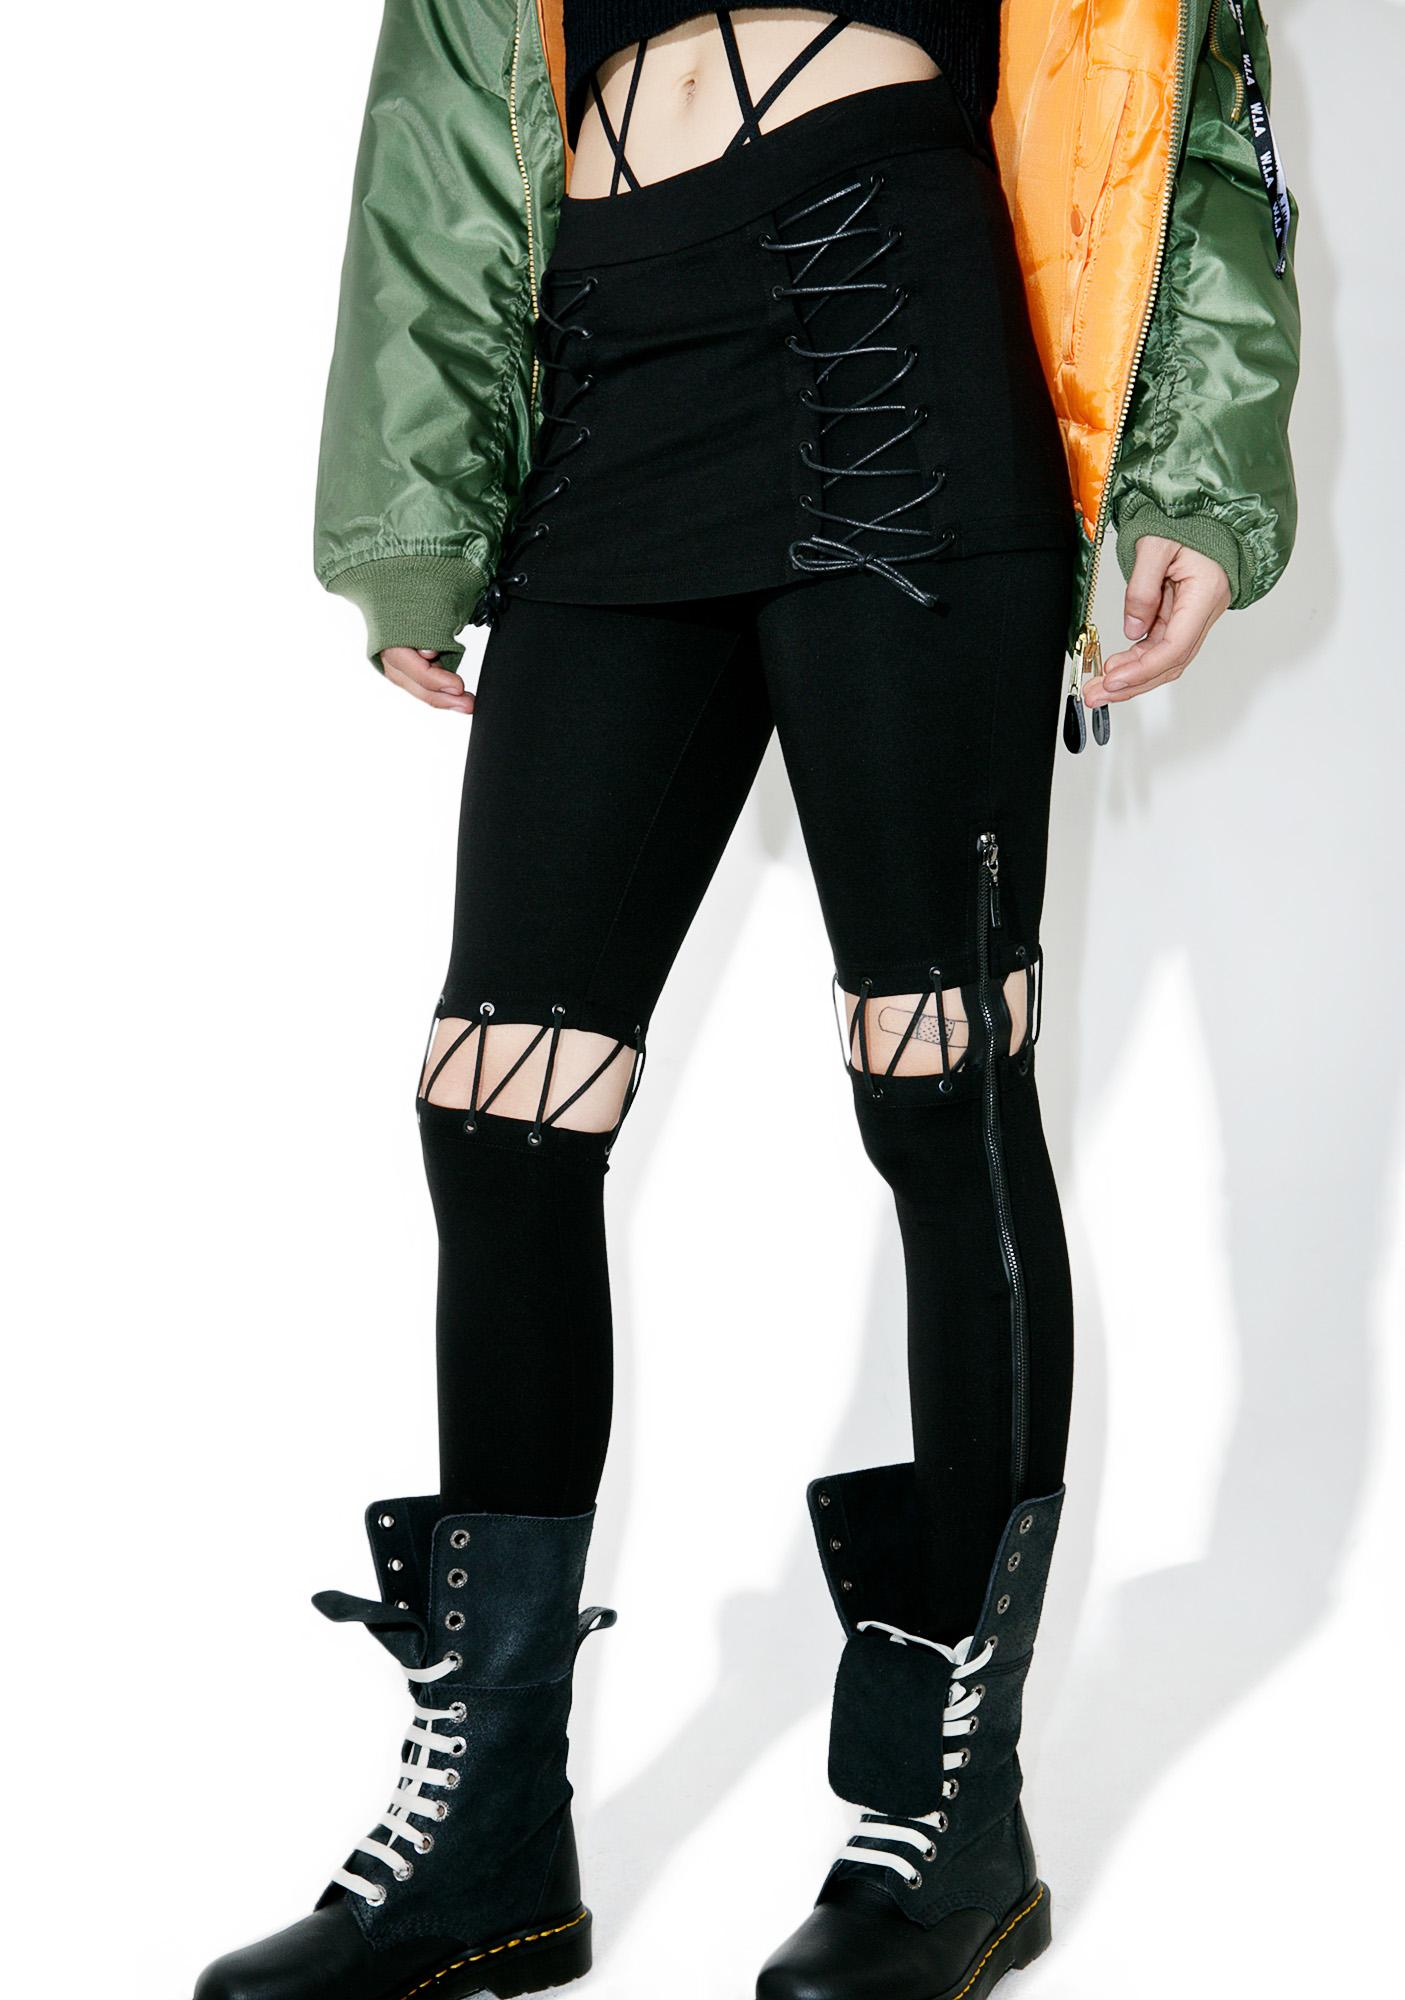 Punk Rave A Different Story Lace-Up Pants